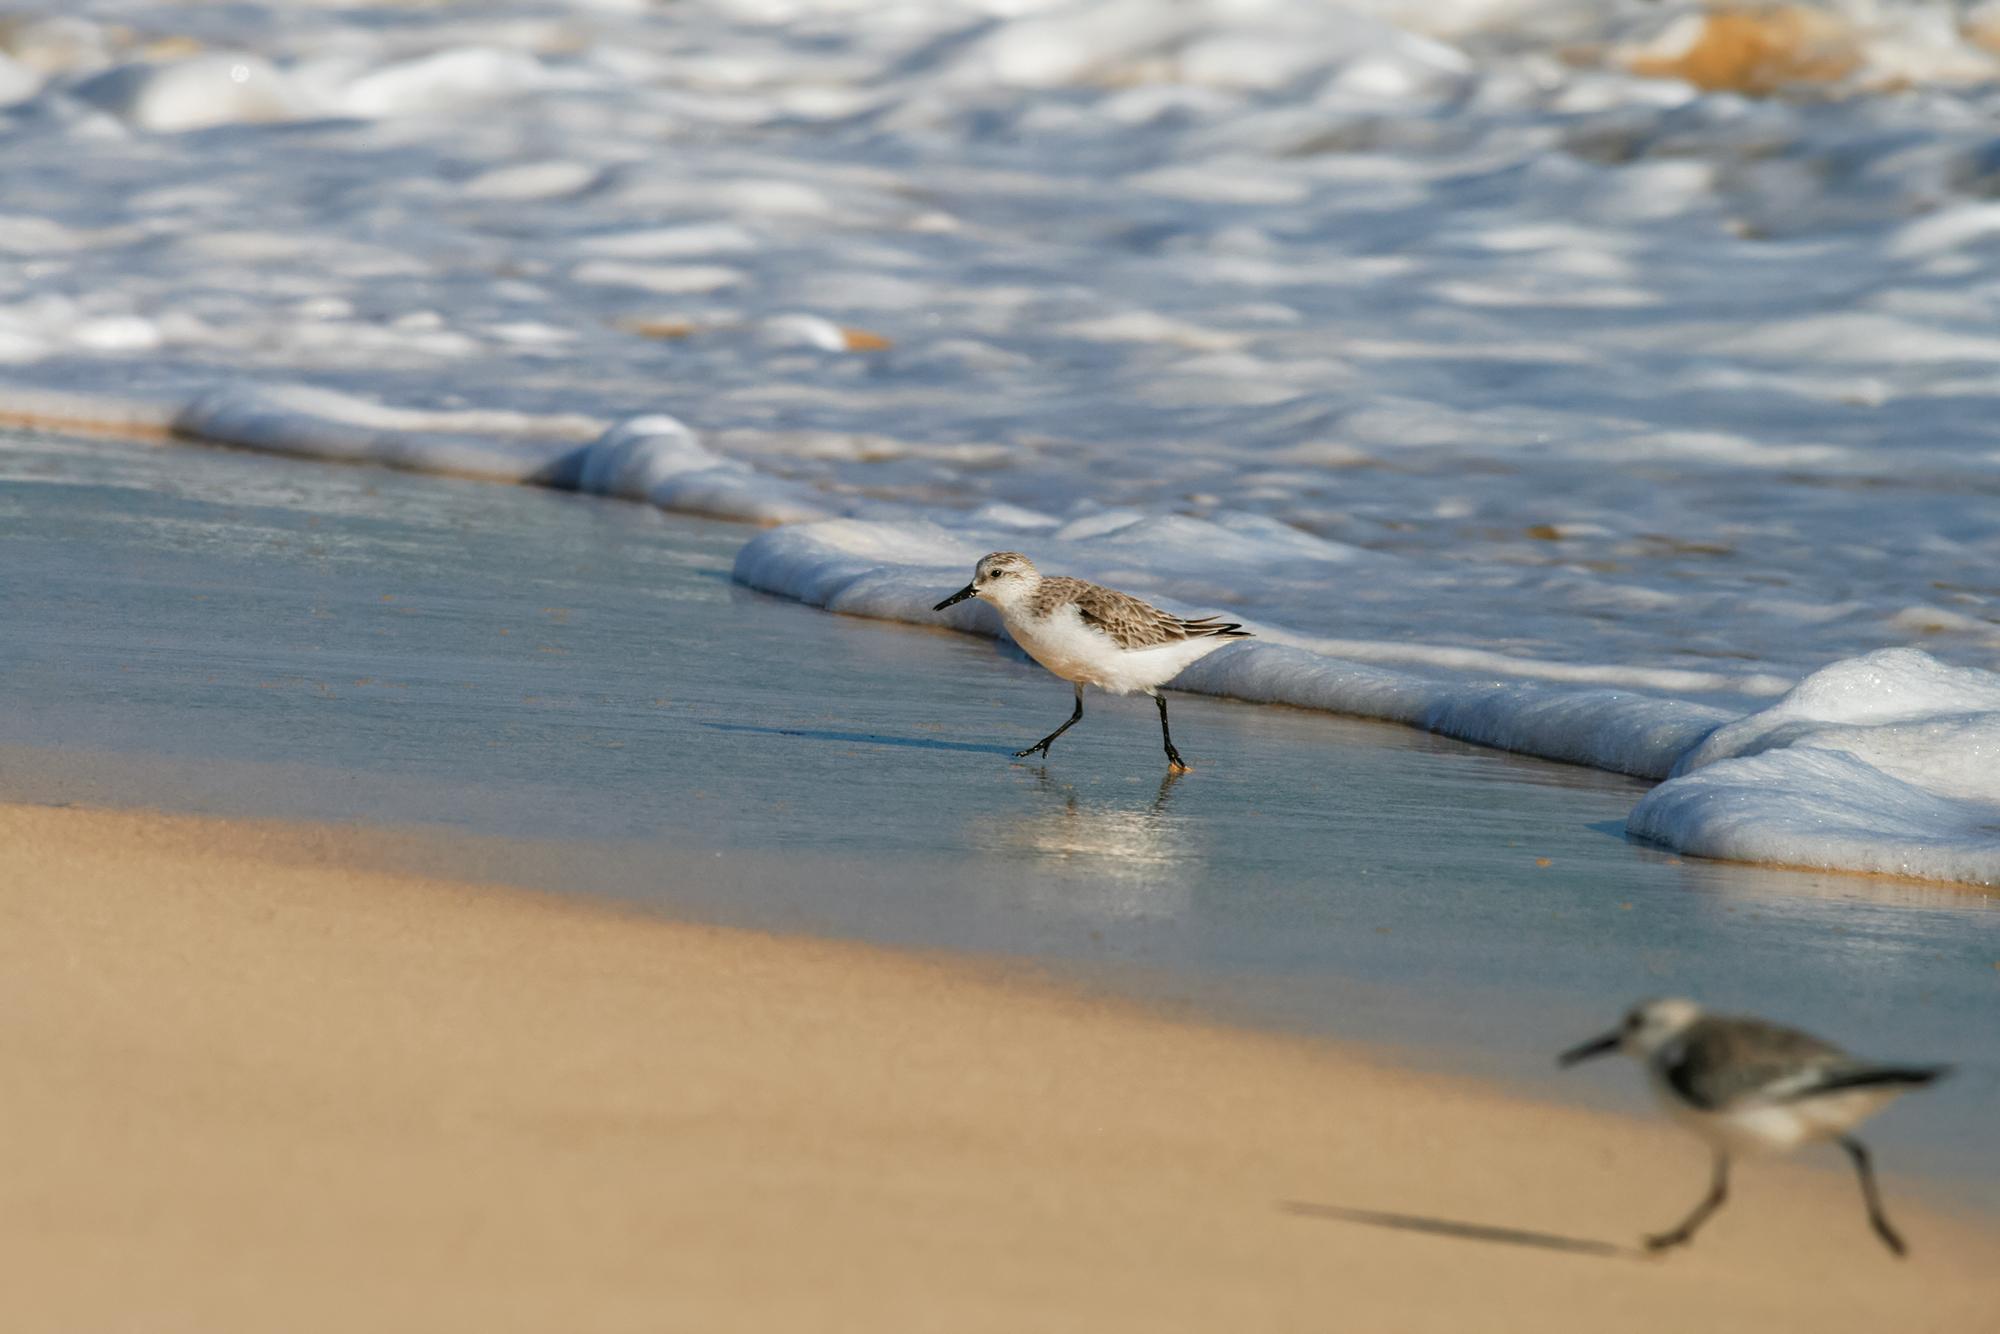 Sandlöpare JPEG_web 9.jpg